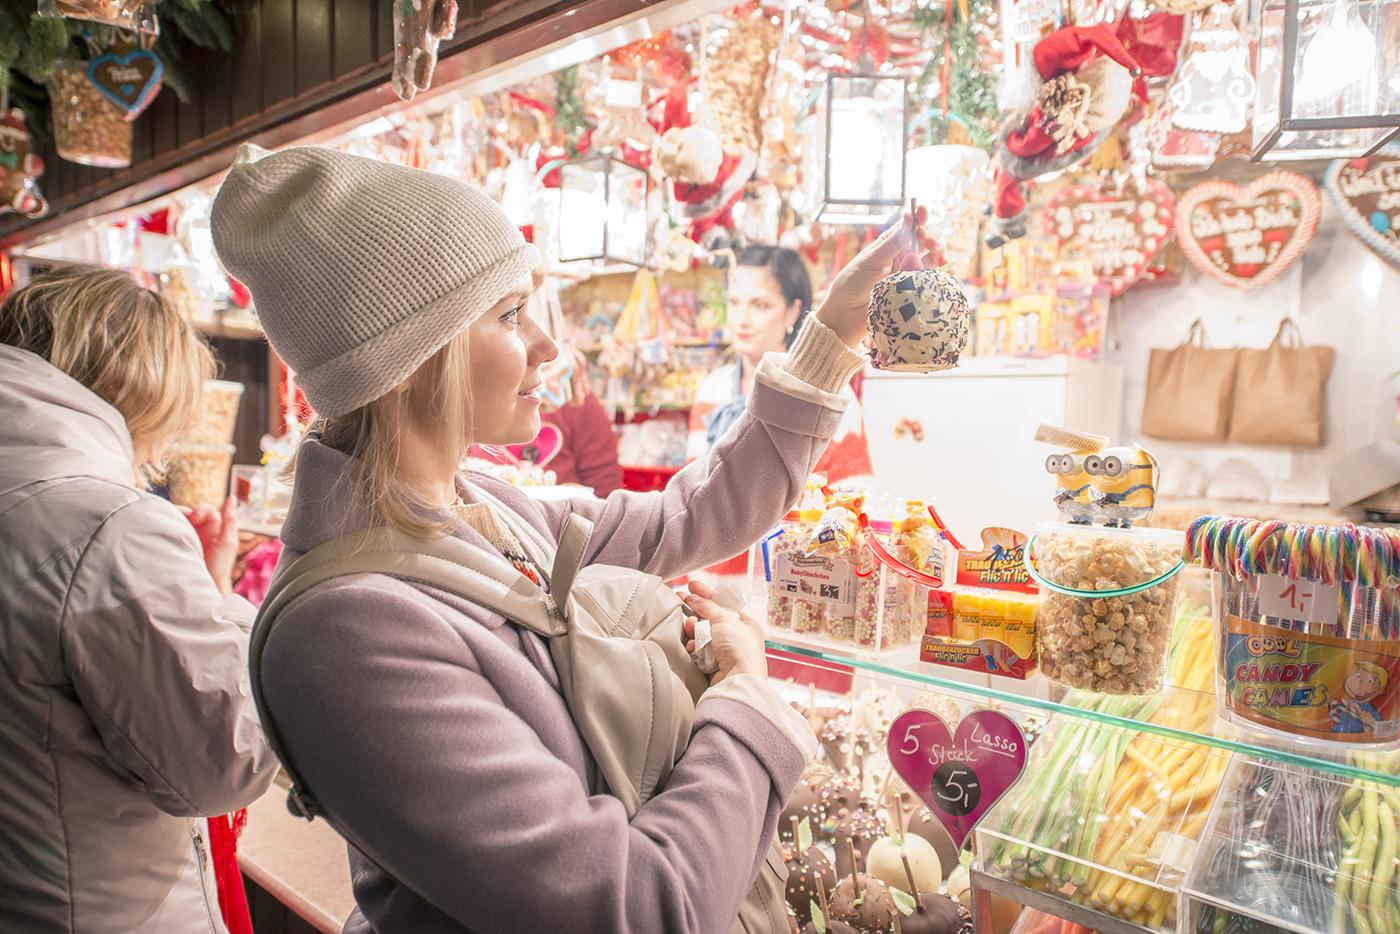 Ingolstadt Village, Nuremberg, Christmas market in Nuremberg, Christmas market, Bavaria, Chic Outlet Shopping, annamidday, анна миддэй, анна мидей, тревел блогер, русский тревел блогер, лучший блогер, лучший российский блогер, аутлеты европы, Нюрнберг, рождественские ярмарки в Нюрнберге, рождественские ярмарки в Европе